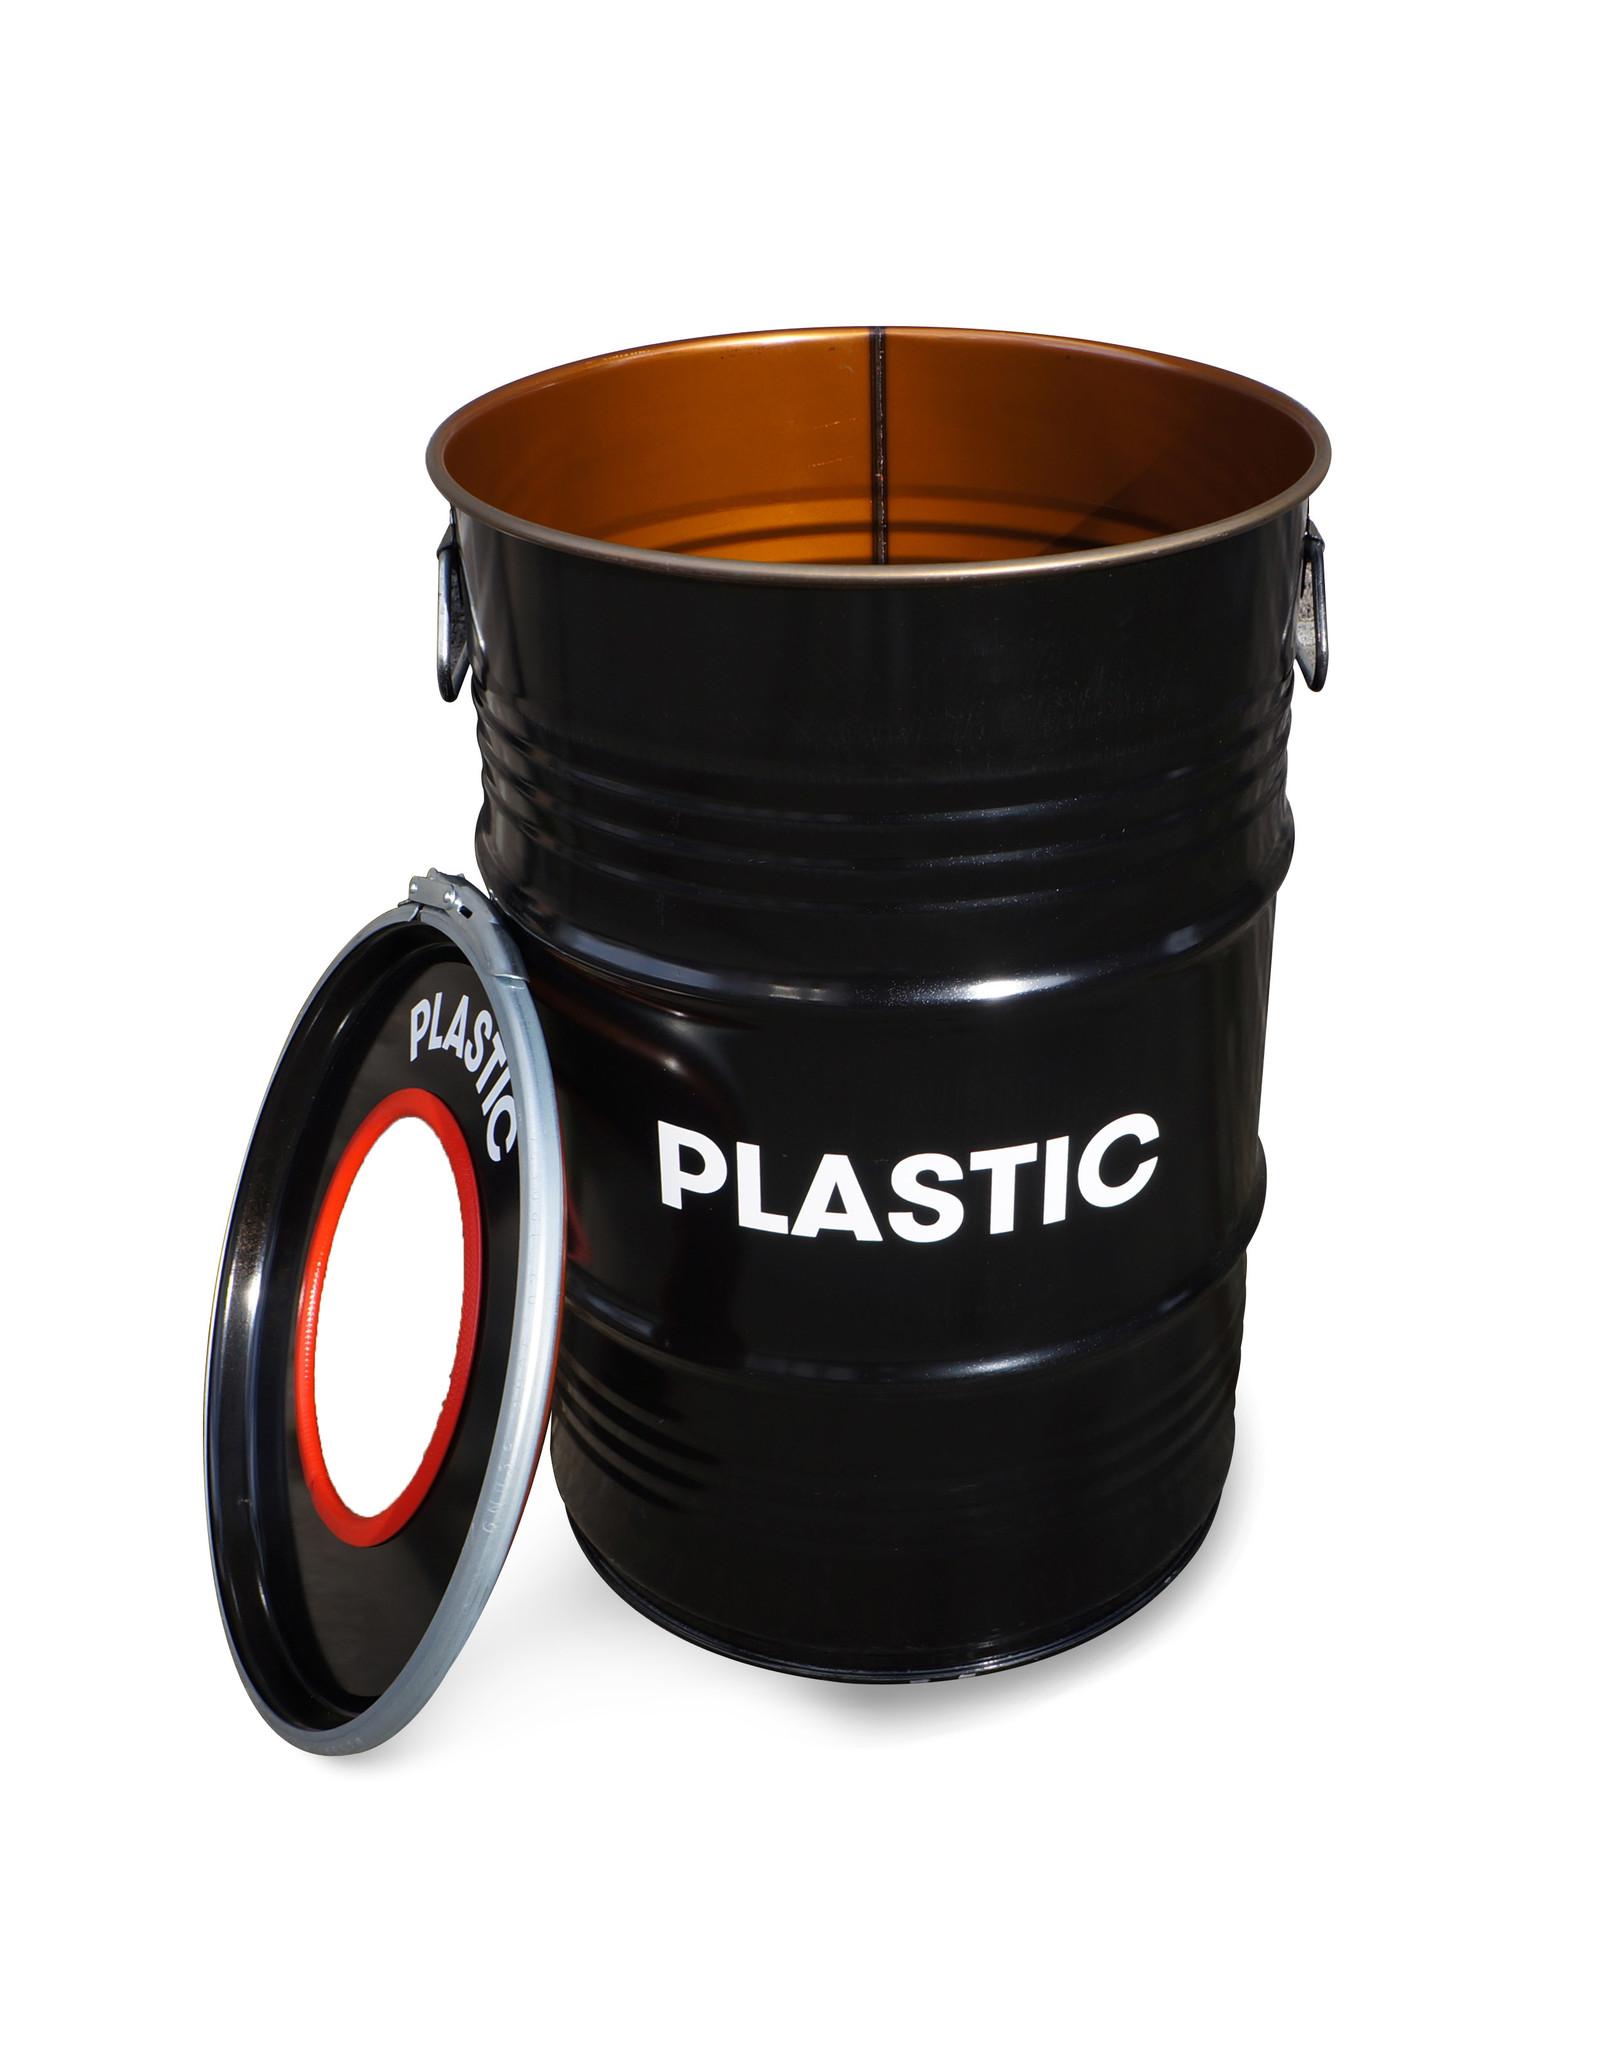 Barrelkings BinBin Hole Plastic industriële prullenbak afvalscheiding 60 Liter olievat voor plastic afval